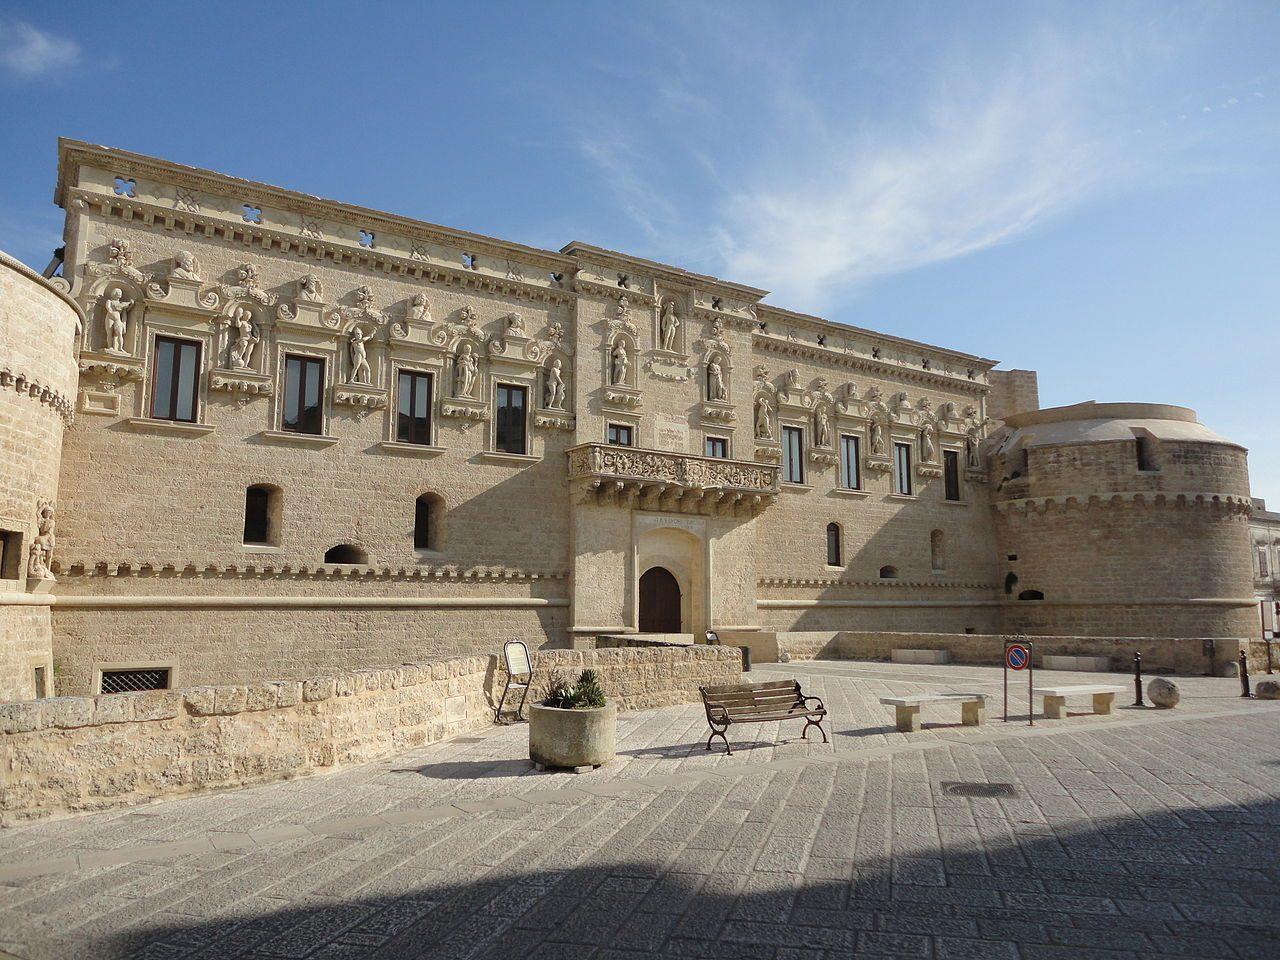 Corigiano d'Otranto